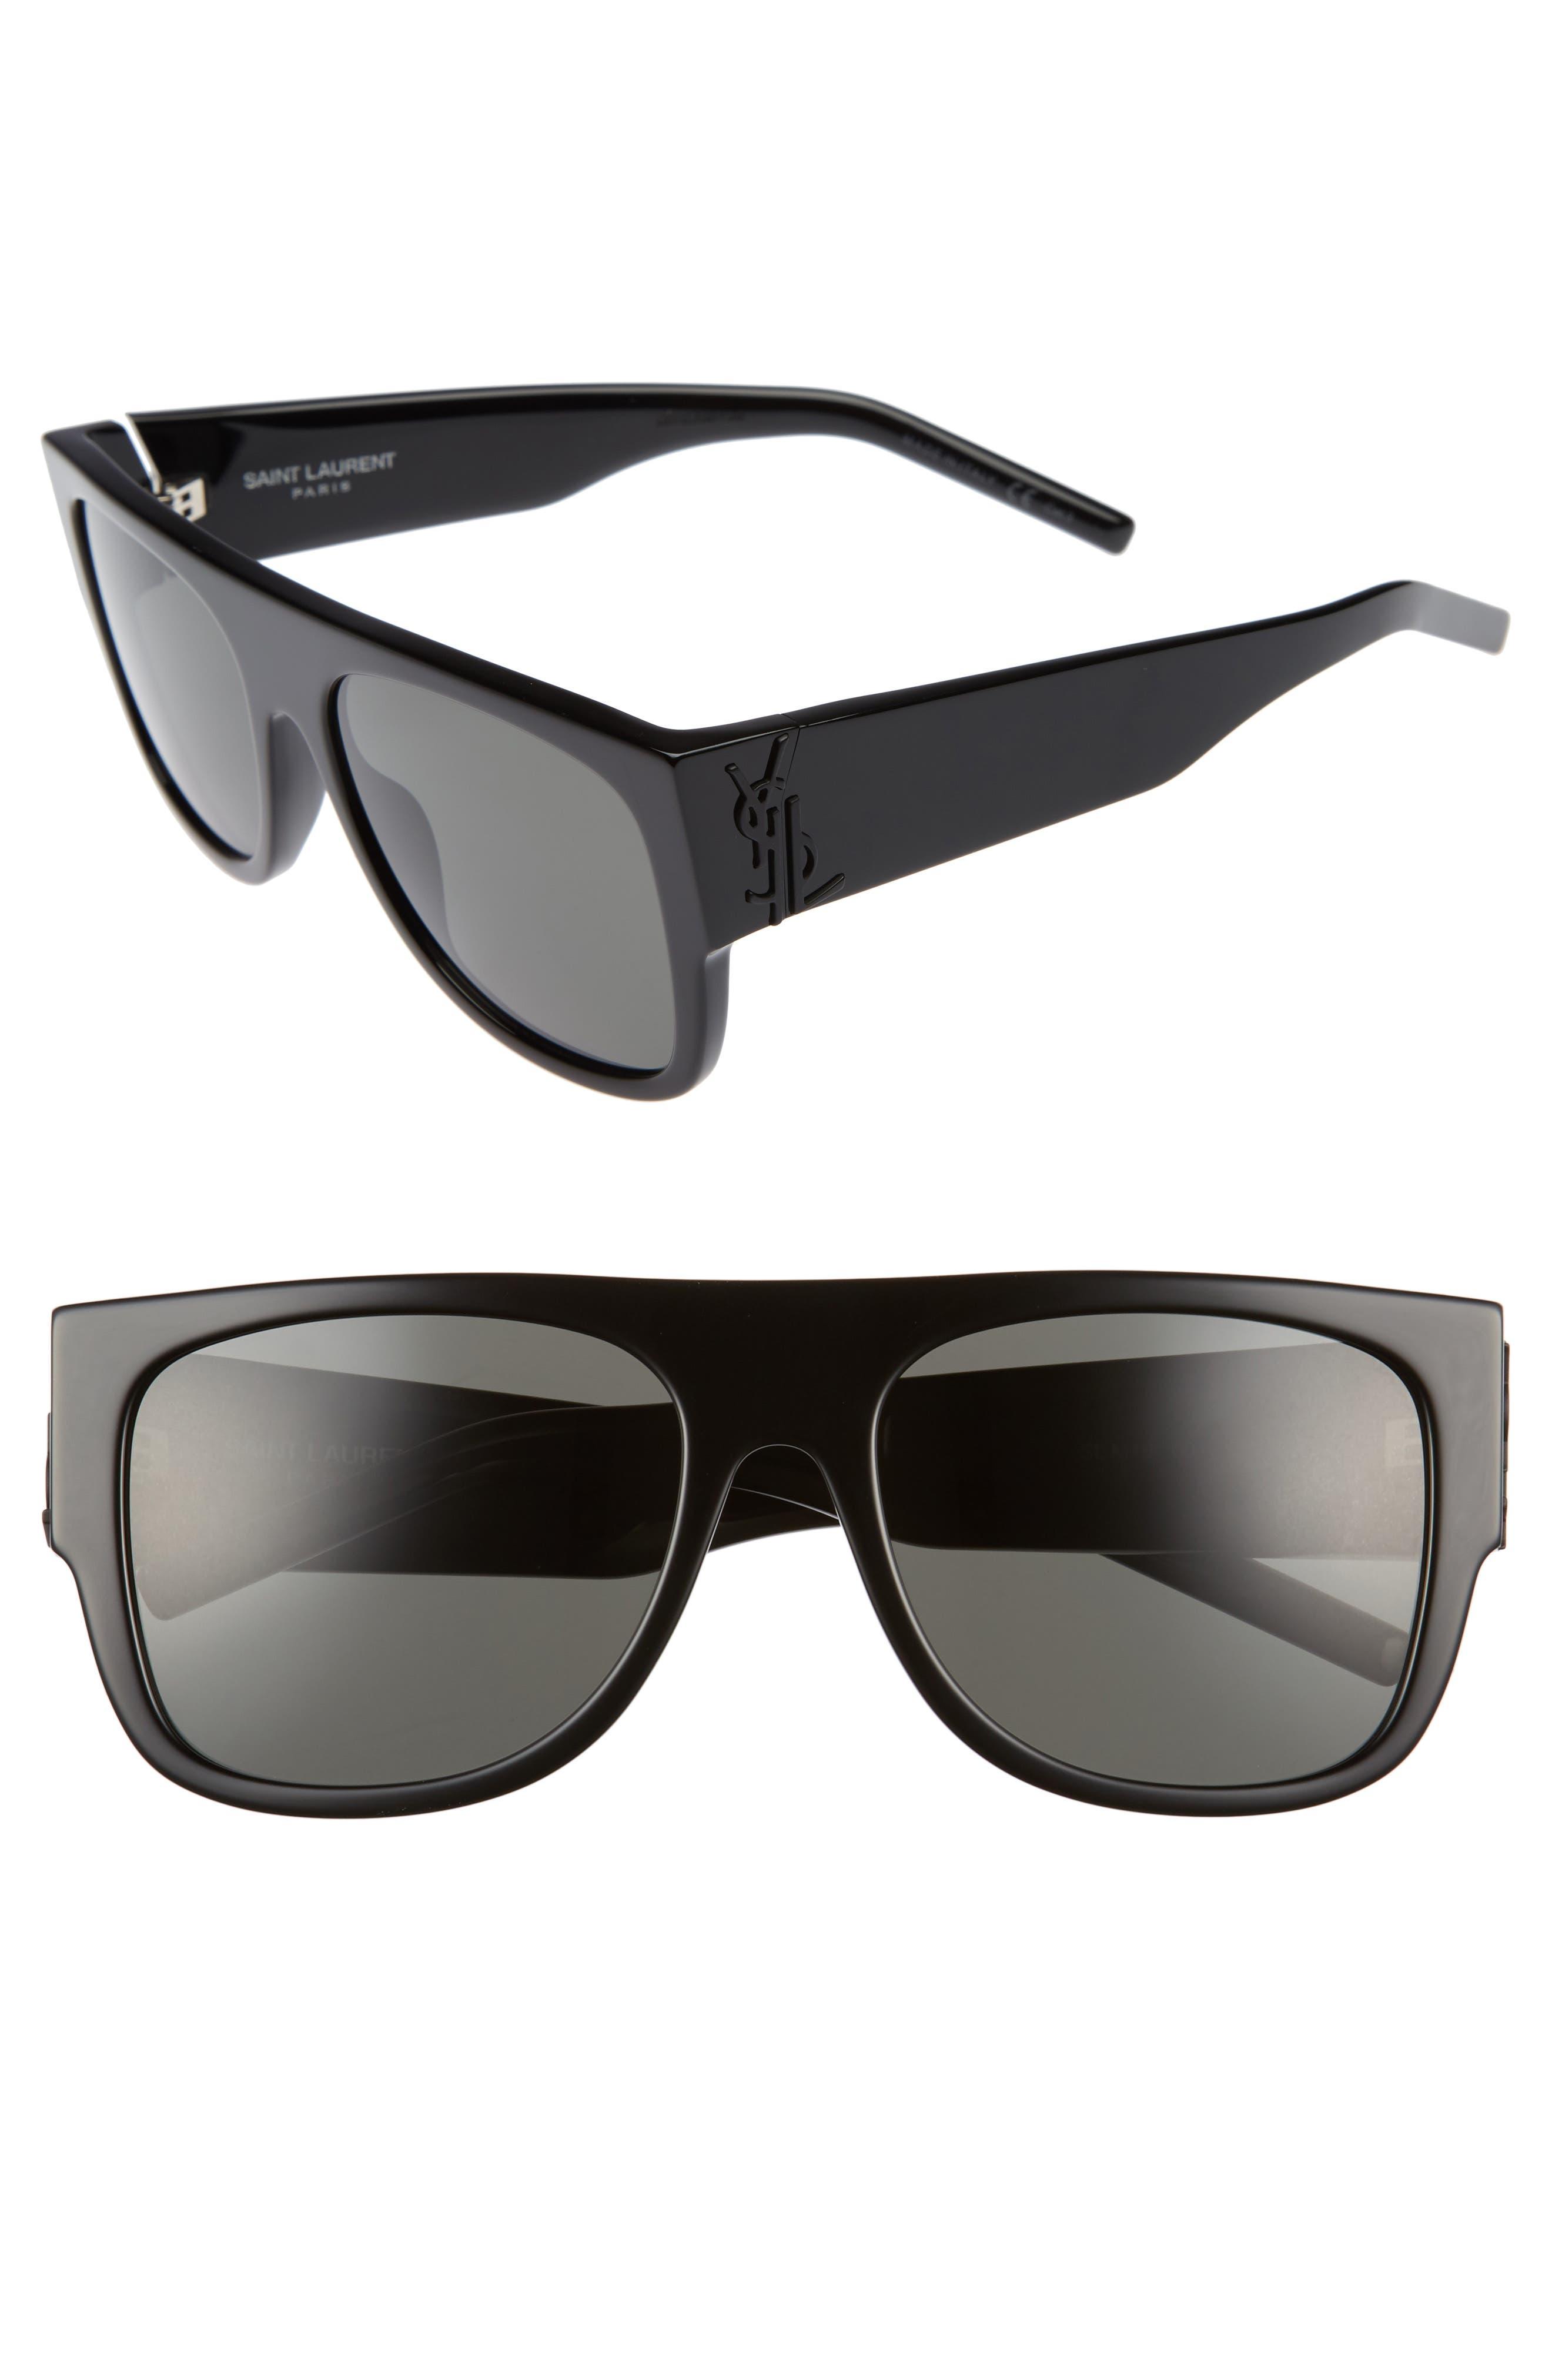 SL M16 55mm Flat Top Sunglasses,                         Main,                         color, 001